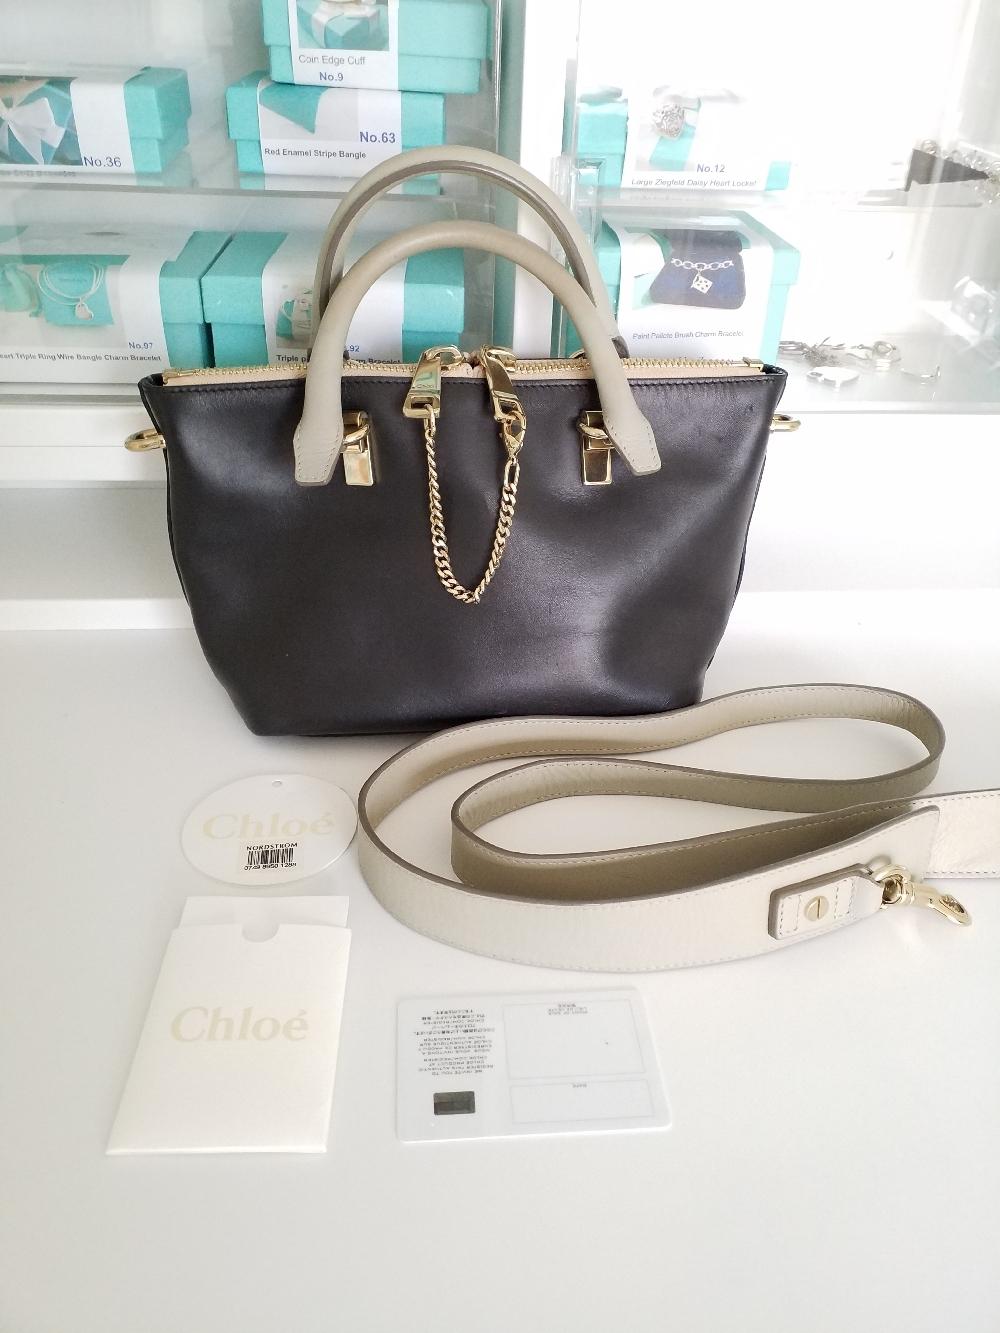 Chloe Baylee Handbag Black Mini bag